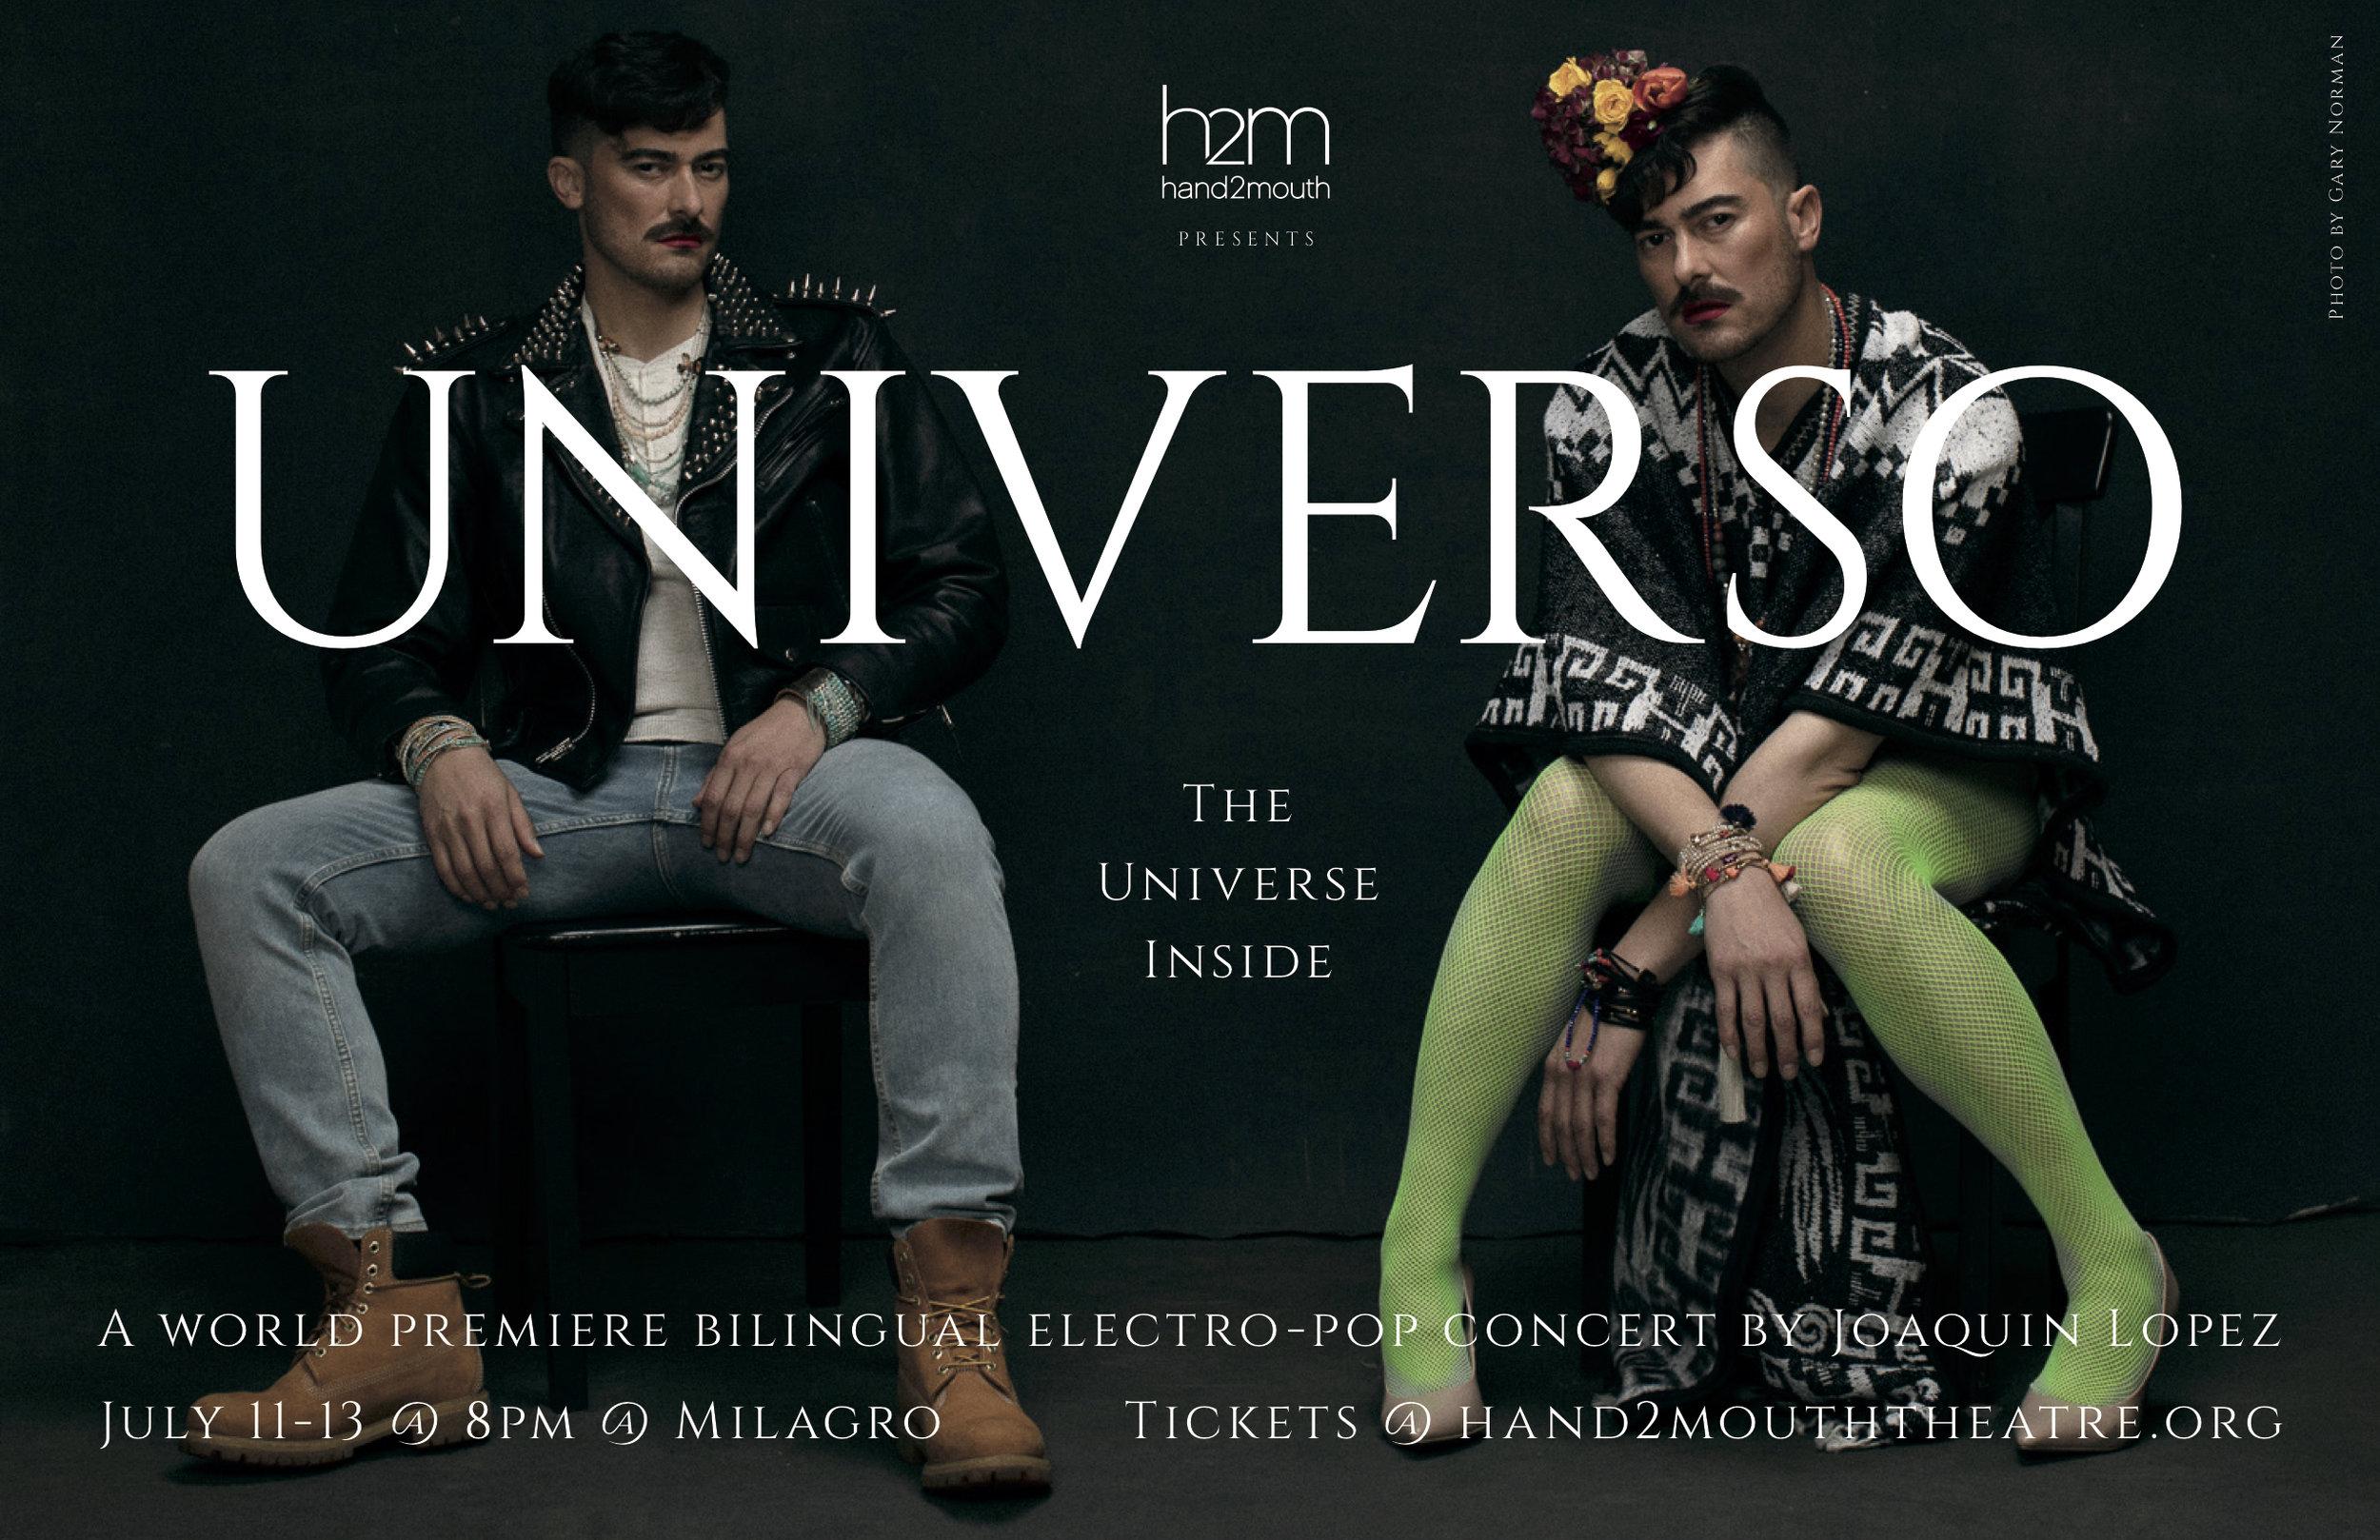 2019.06.04 Universo Poster.jpg